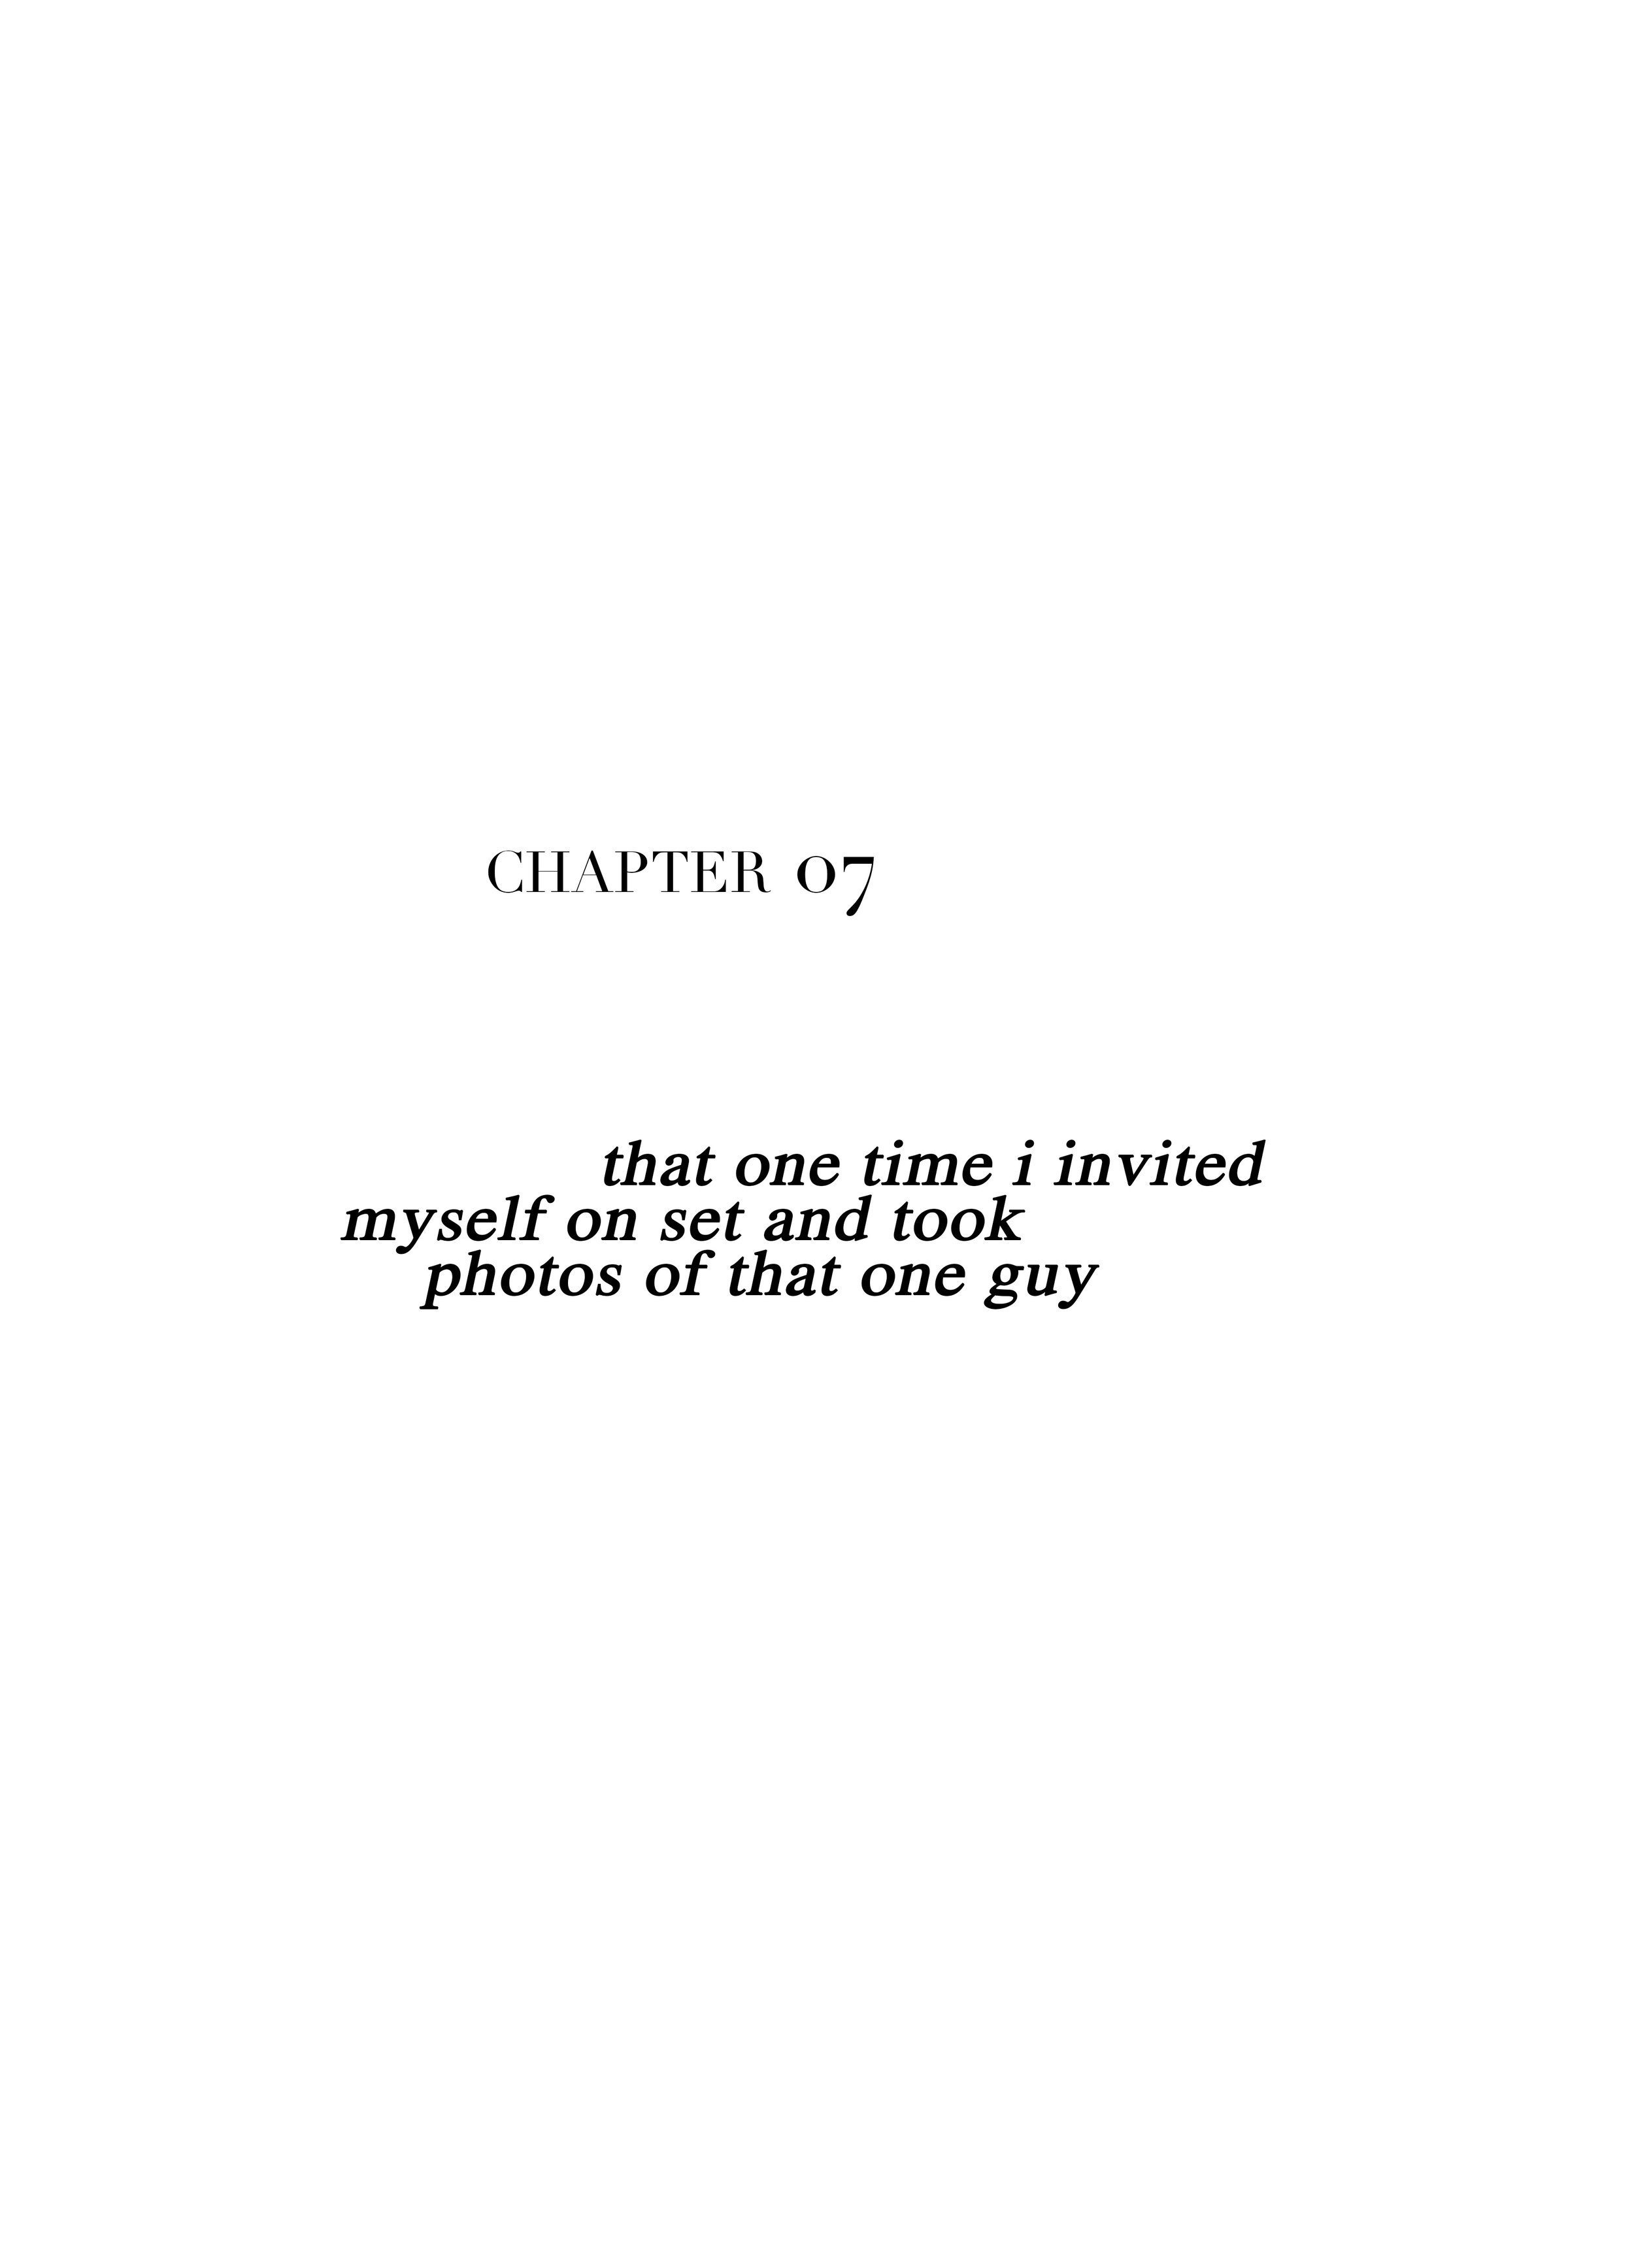 chapter07celebrity01.jpg